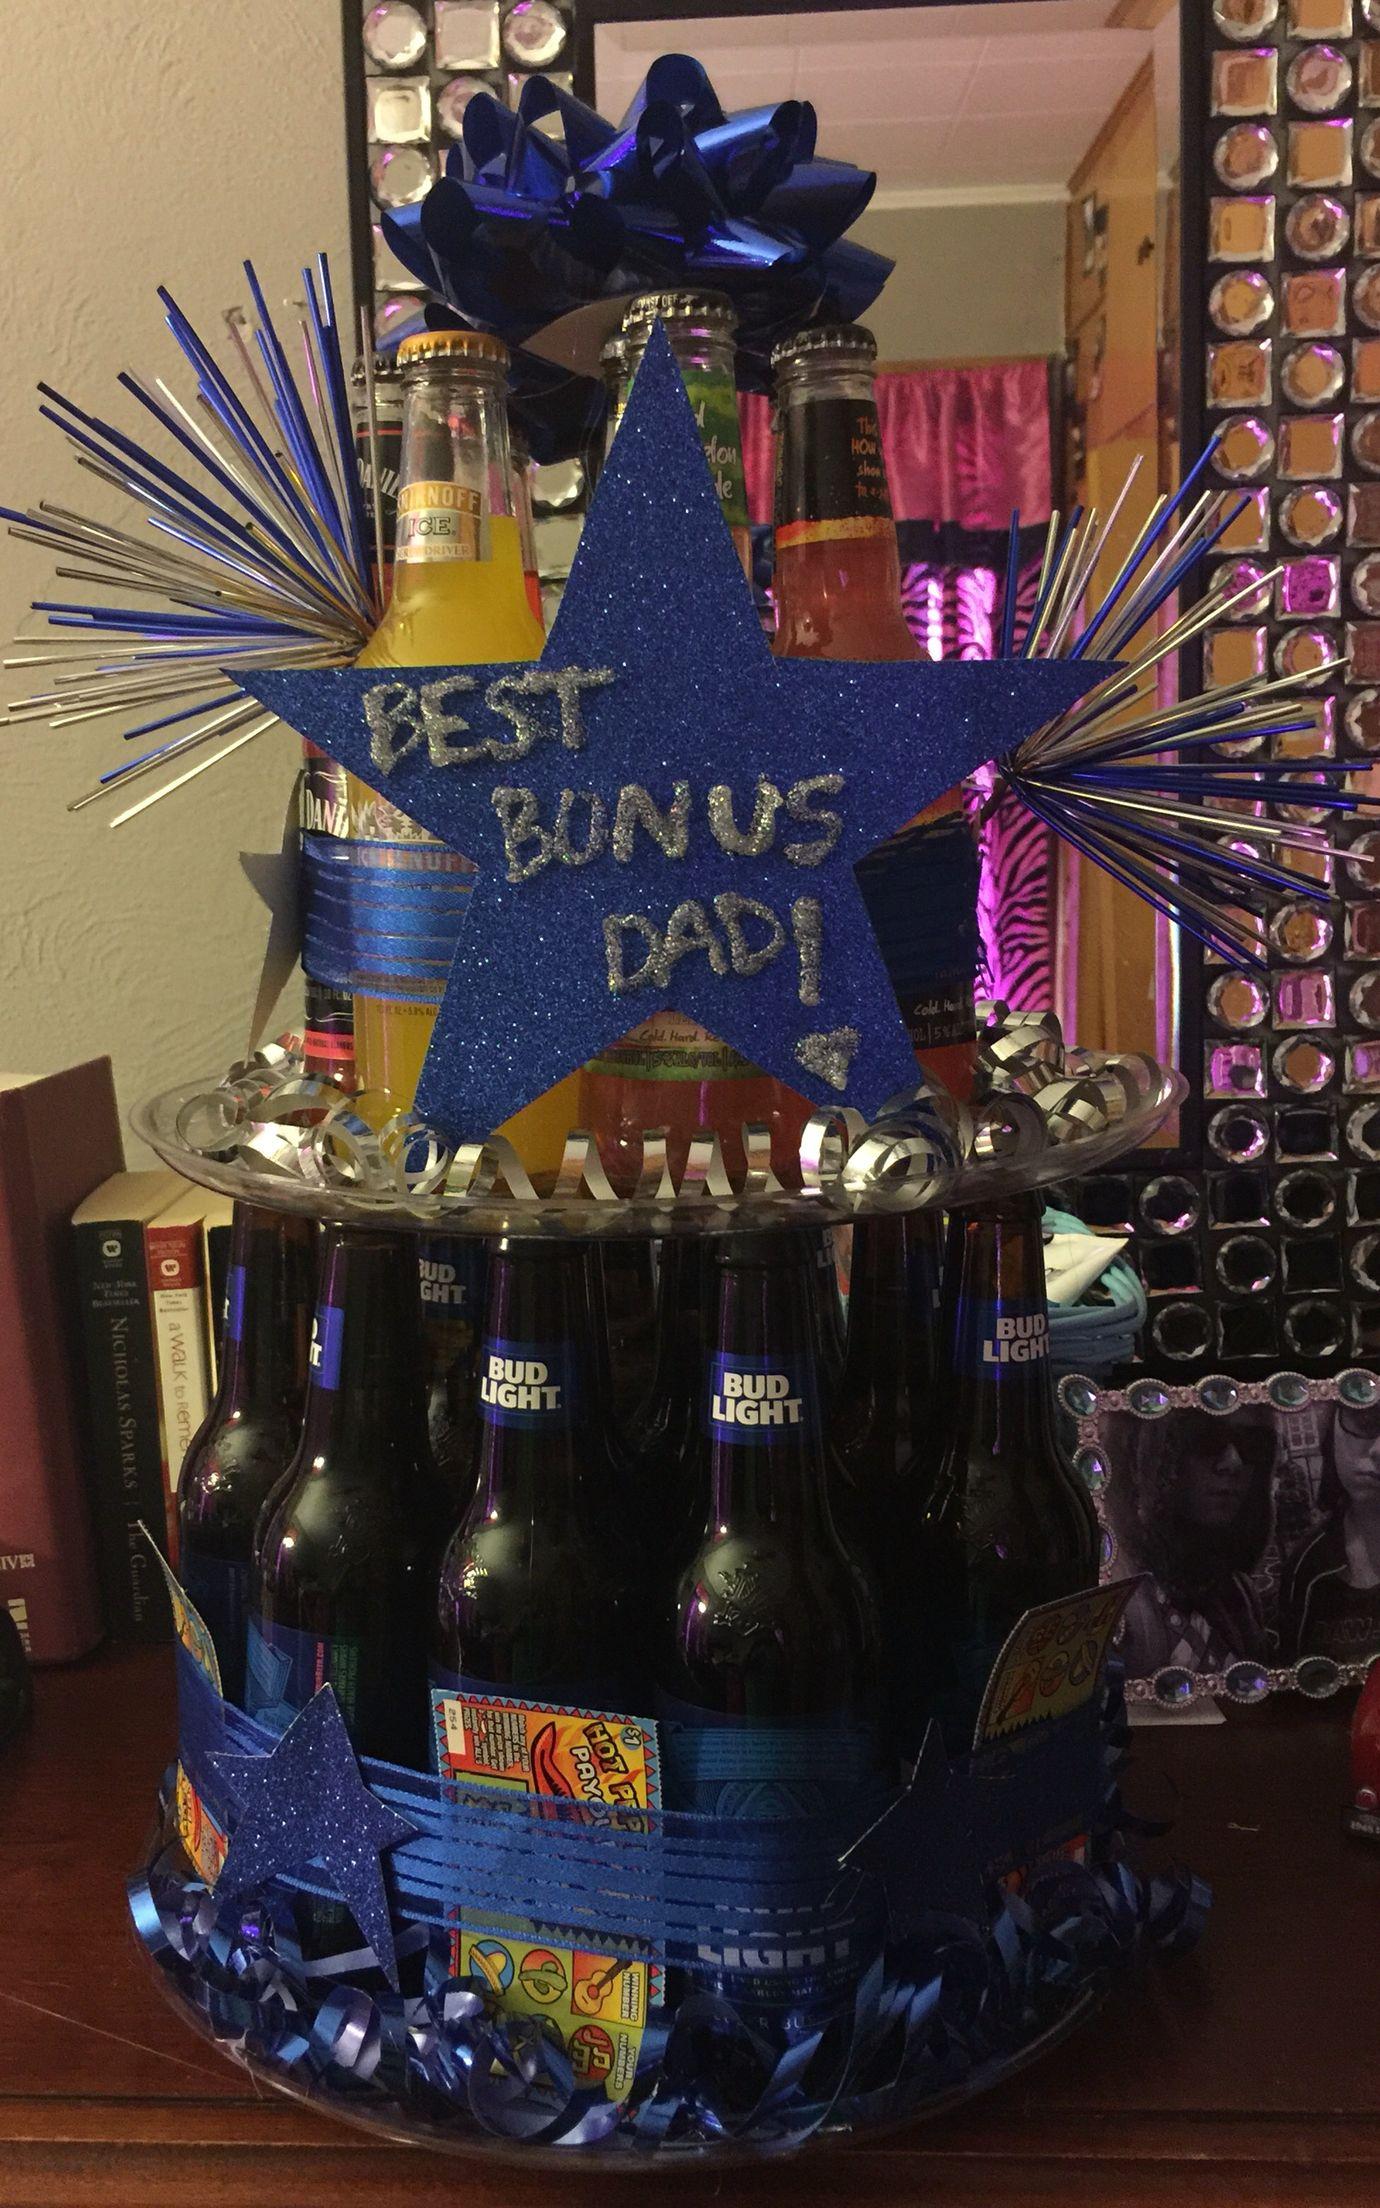 Best bonus dad by kyla caden stepdad fathers day gifts